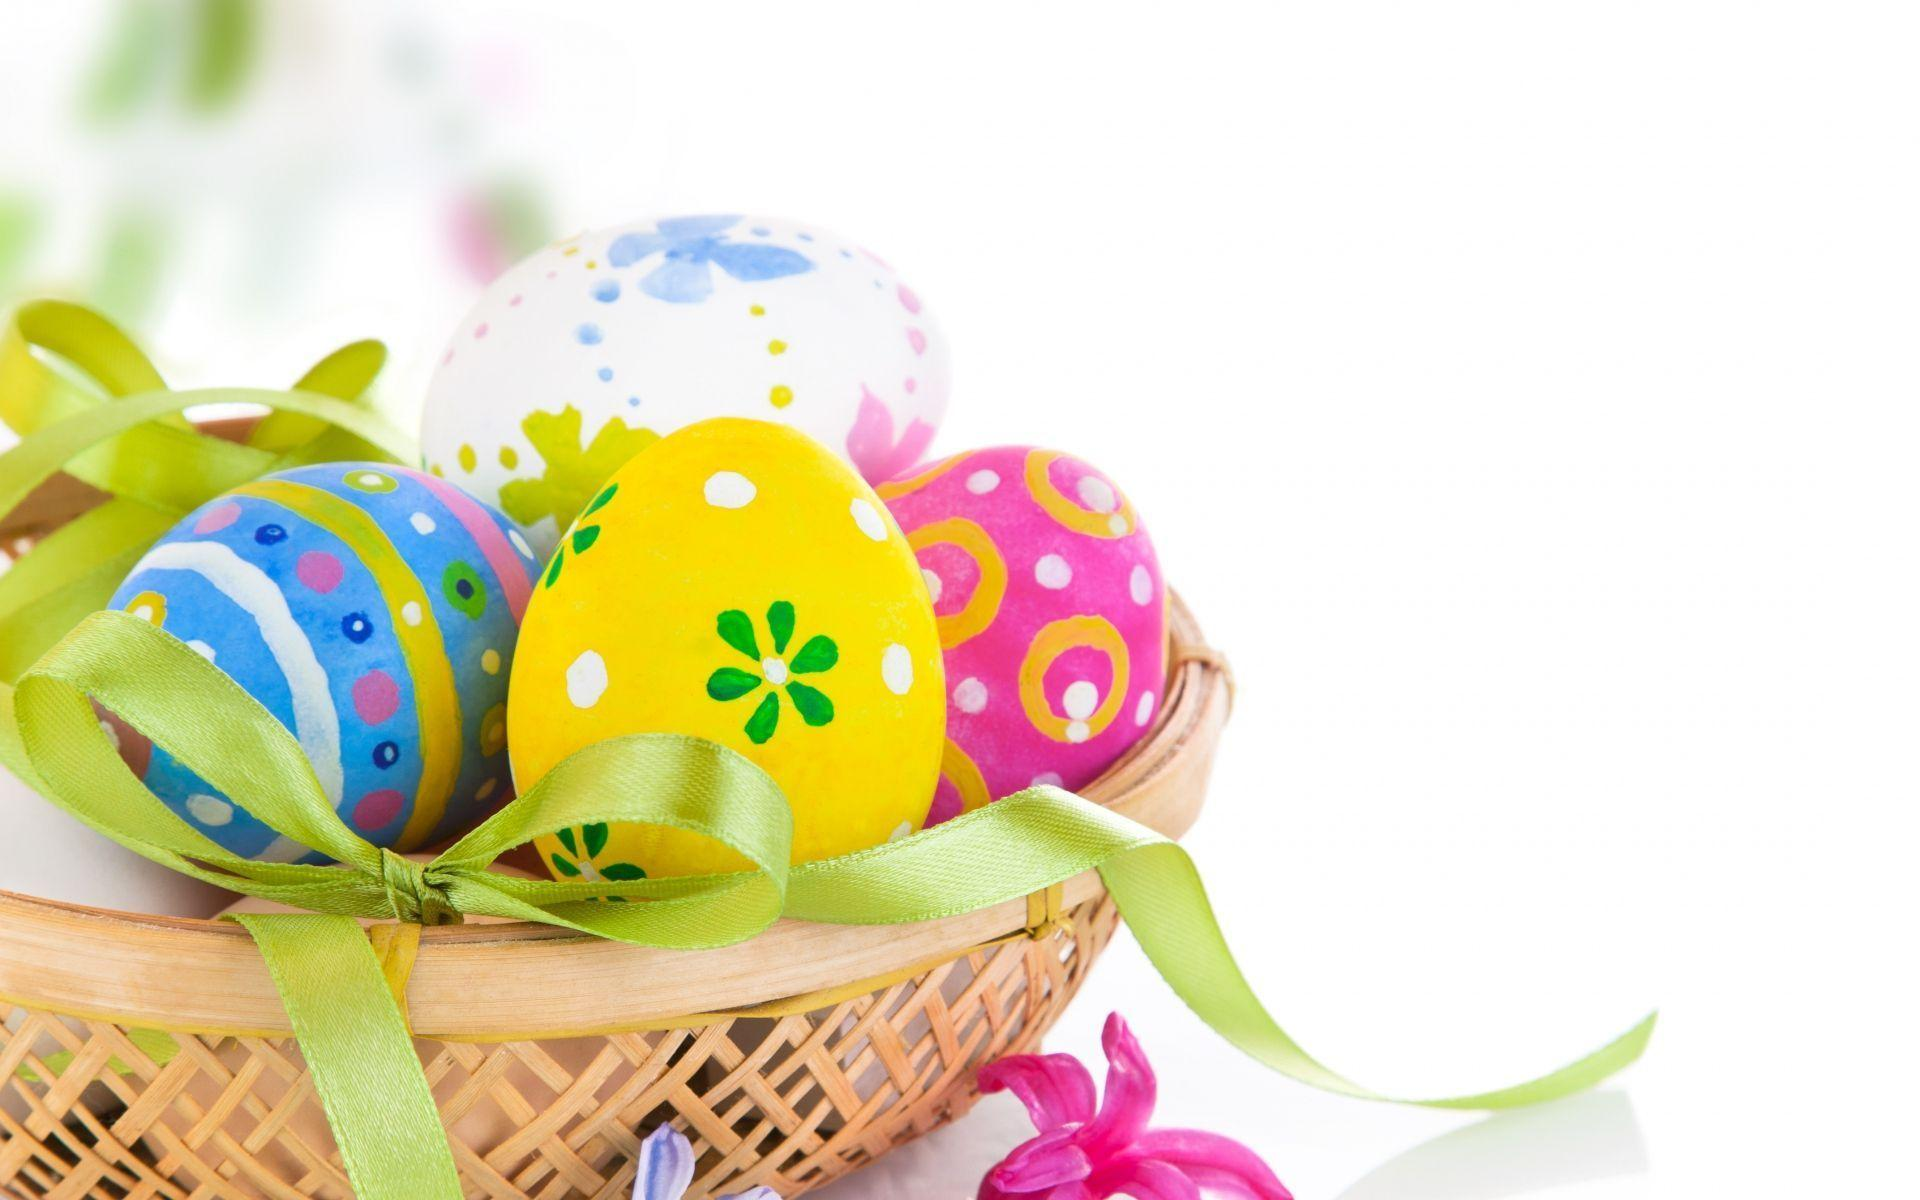 Easter Egg Wallpapers Desktop 1920x1200